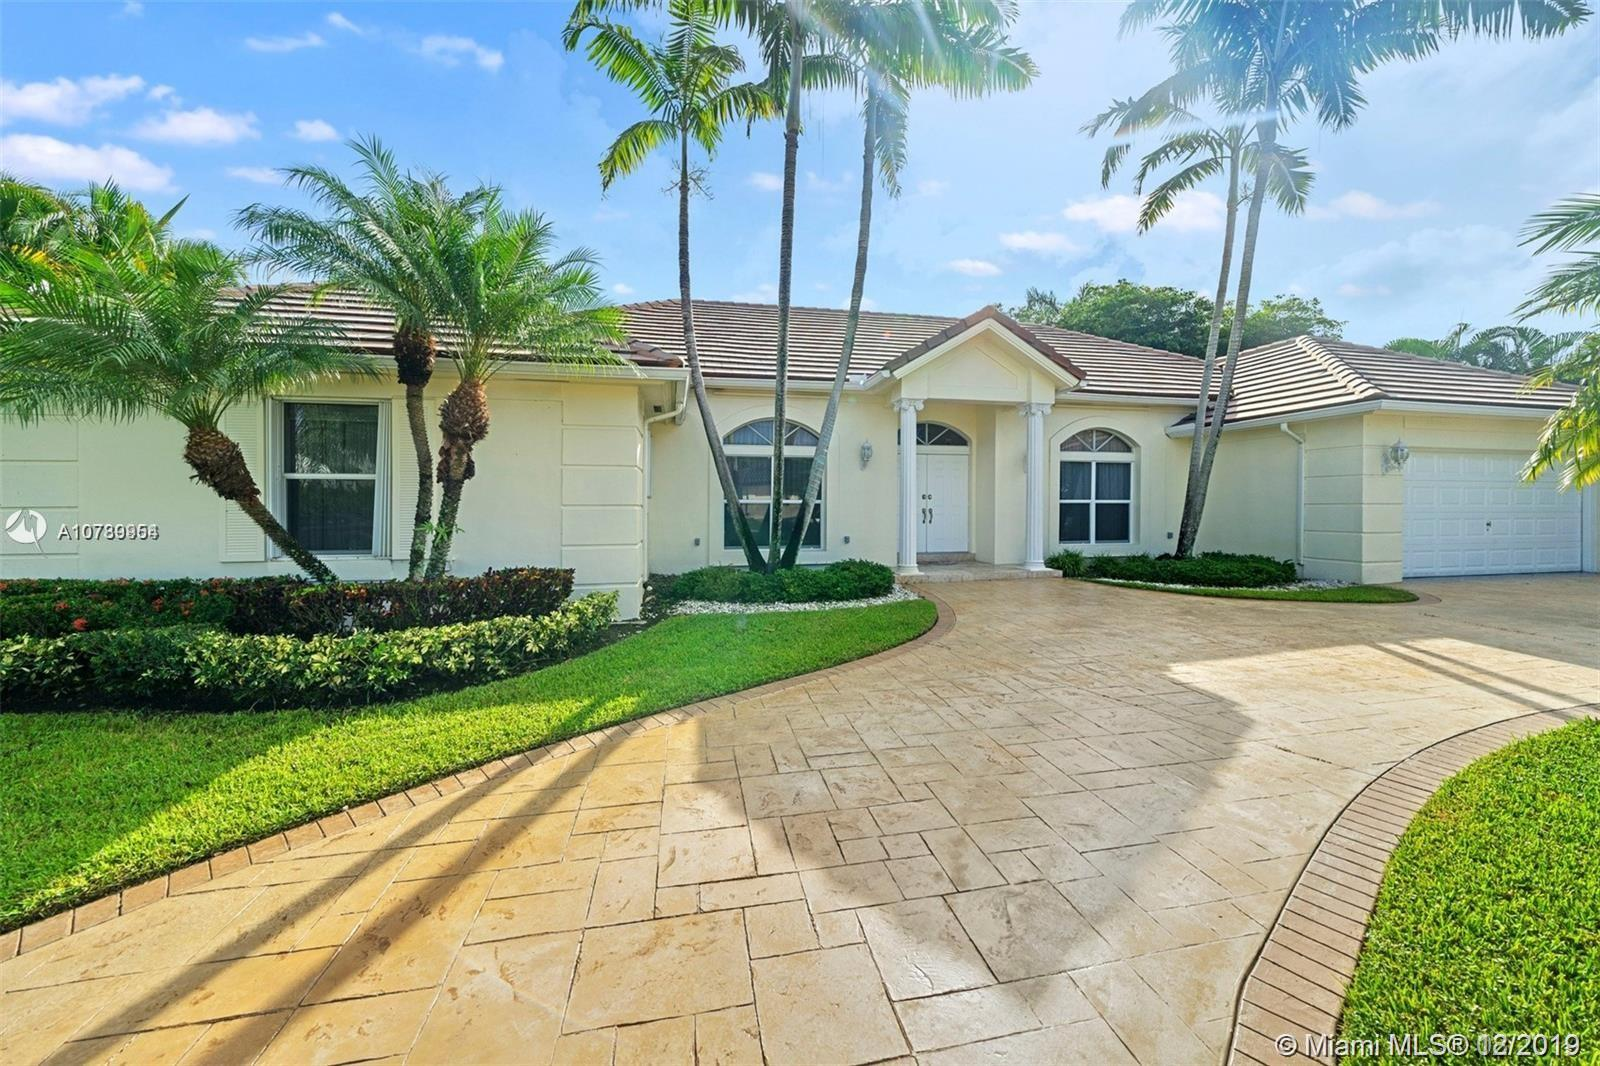 Property for sale at 5253 NW 94th Doral Pl, Doral,  Florida 33178